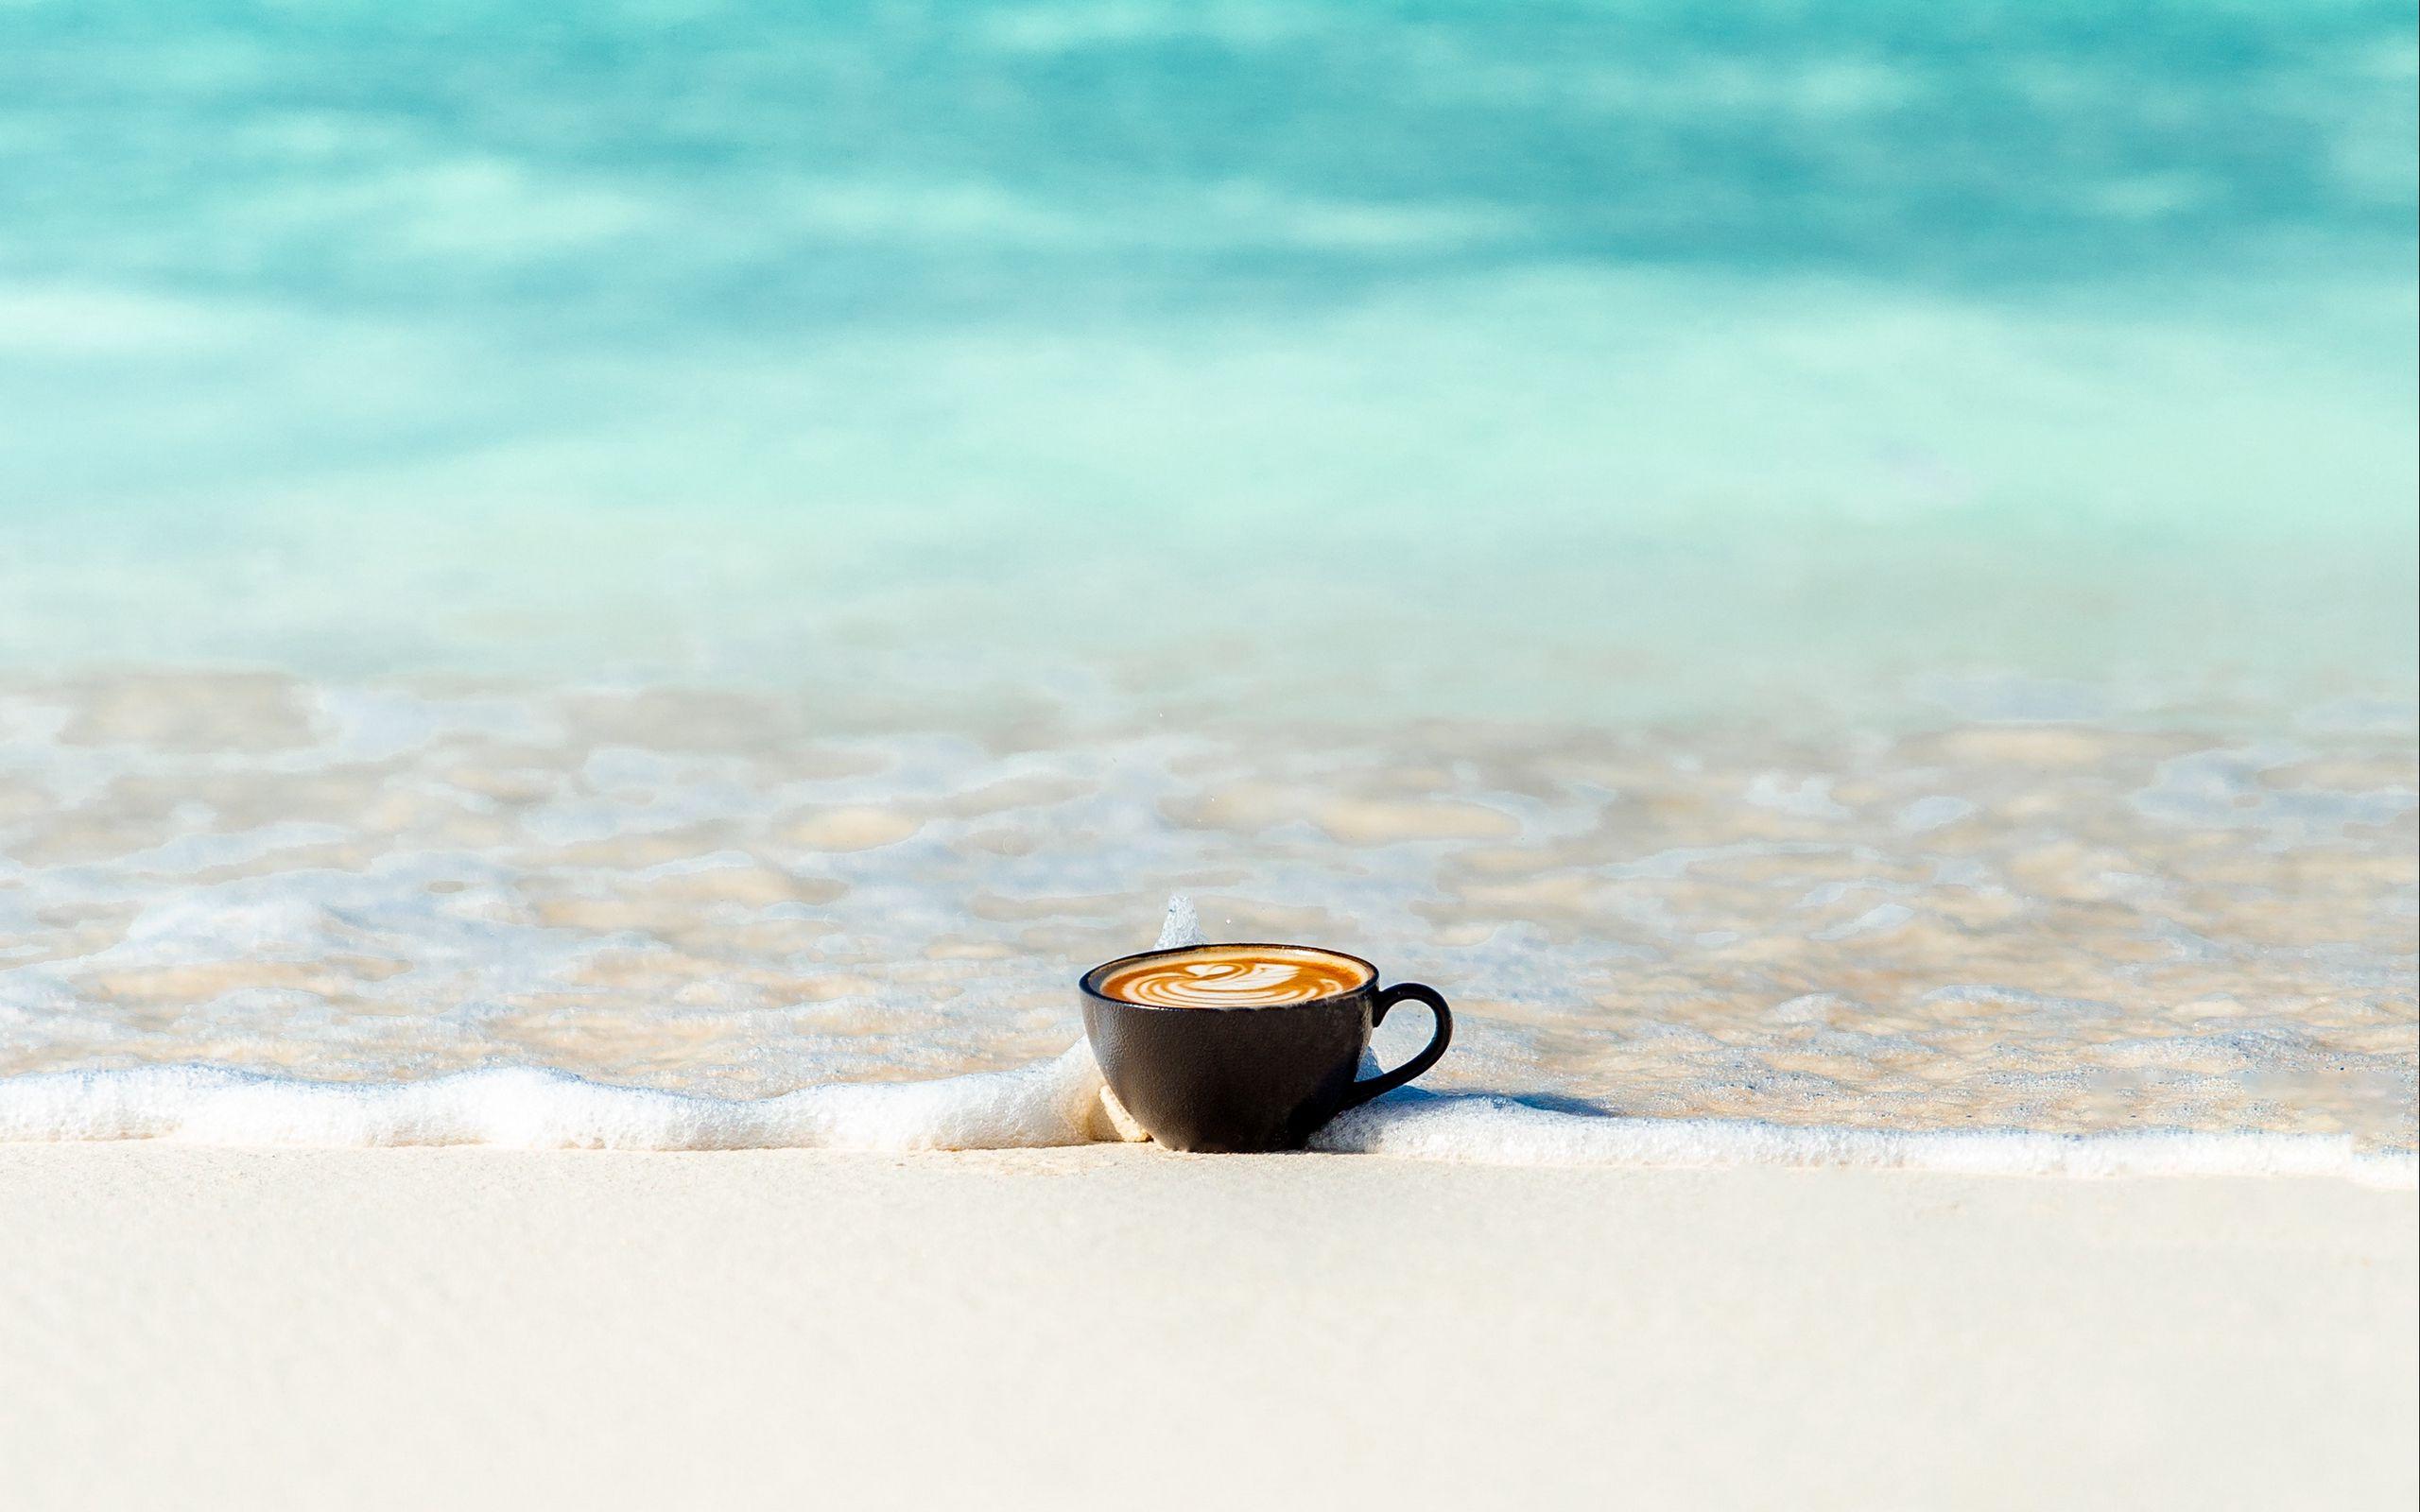 2560x1600 Wallpaper cup, ocean, sand, coast, minimalism